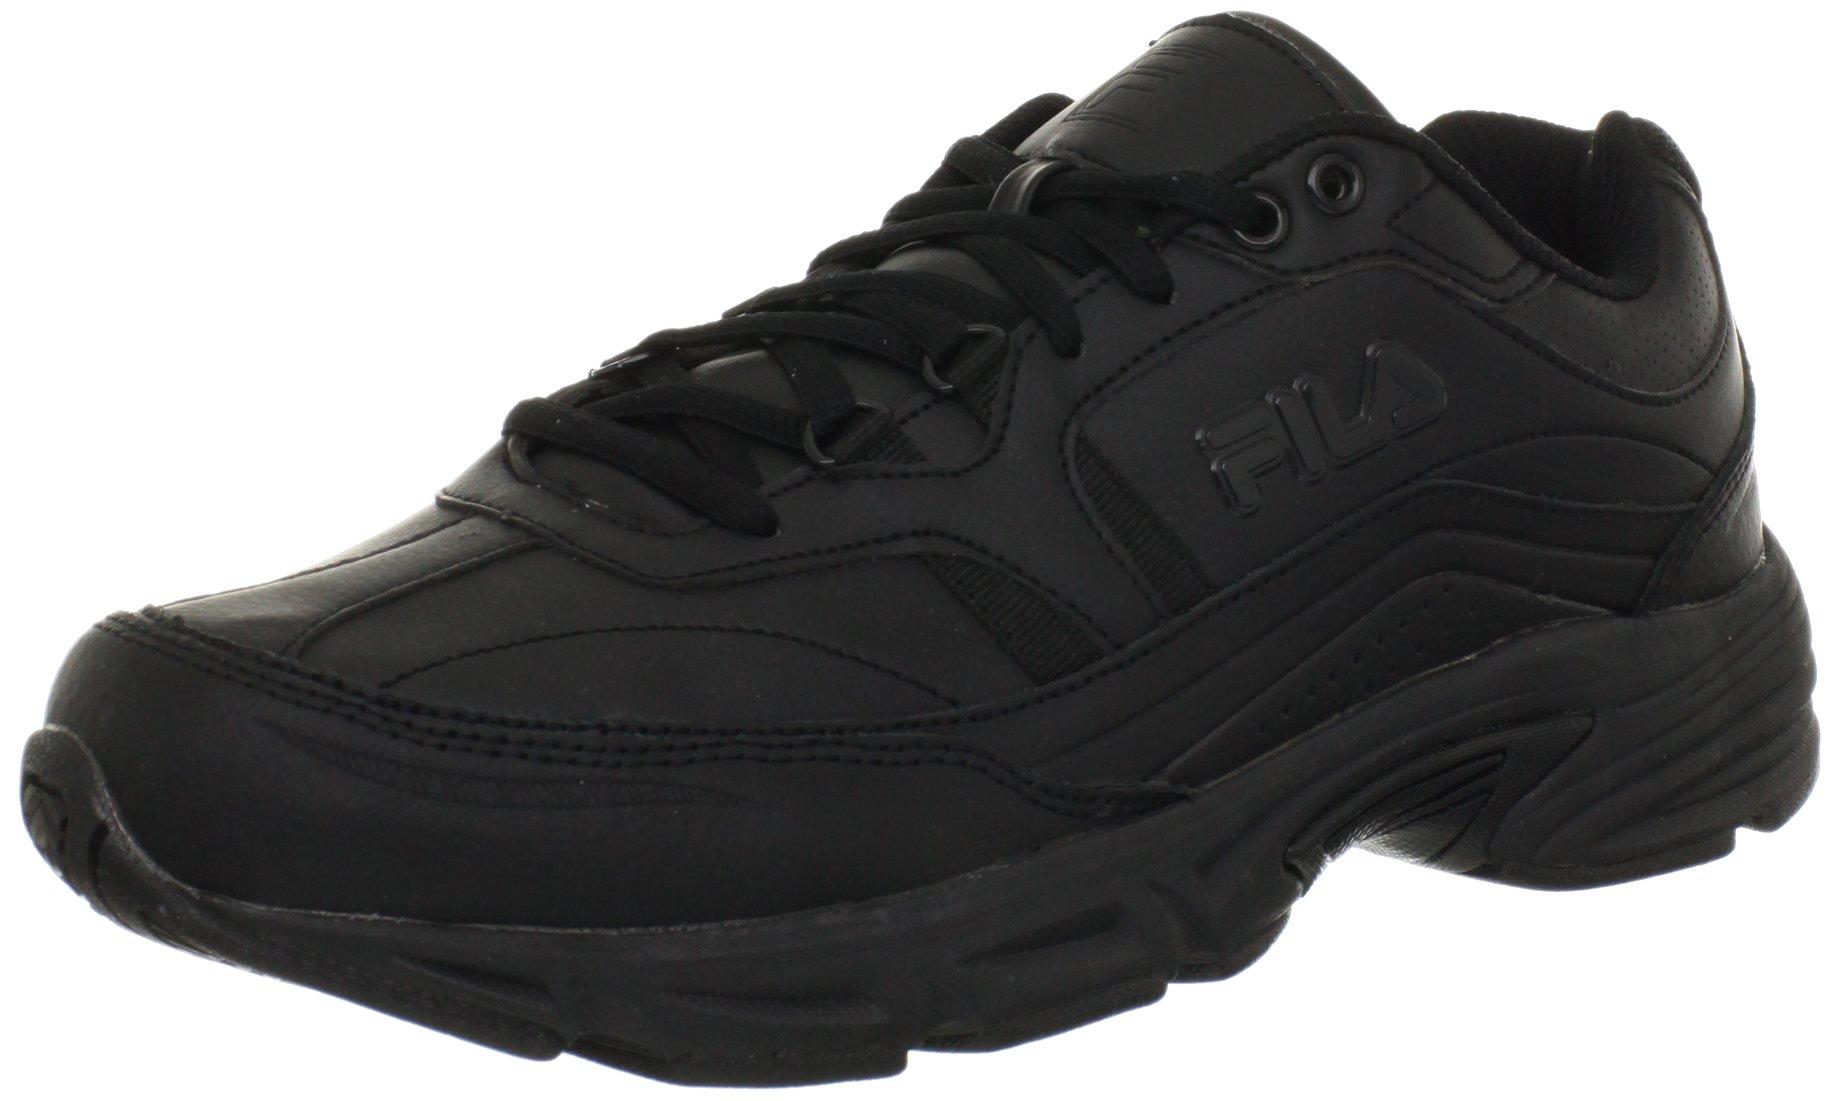 Fila Men's Memory Workshift Cross-Training Shoe,Black/Black/Black,11.5 4E US by Fila